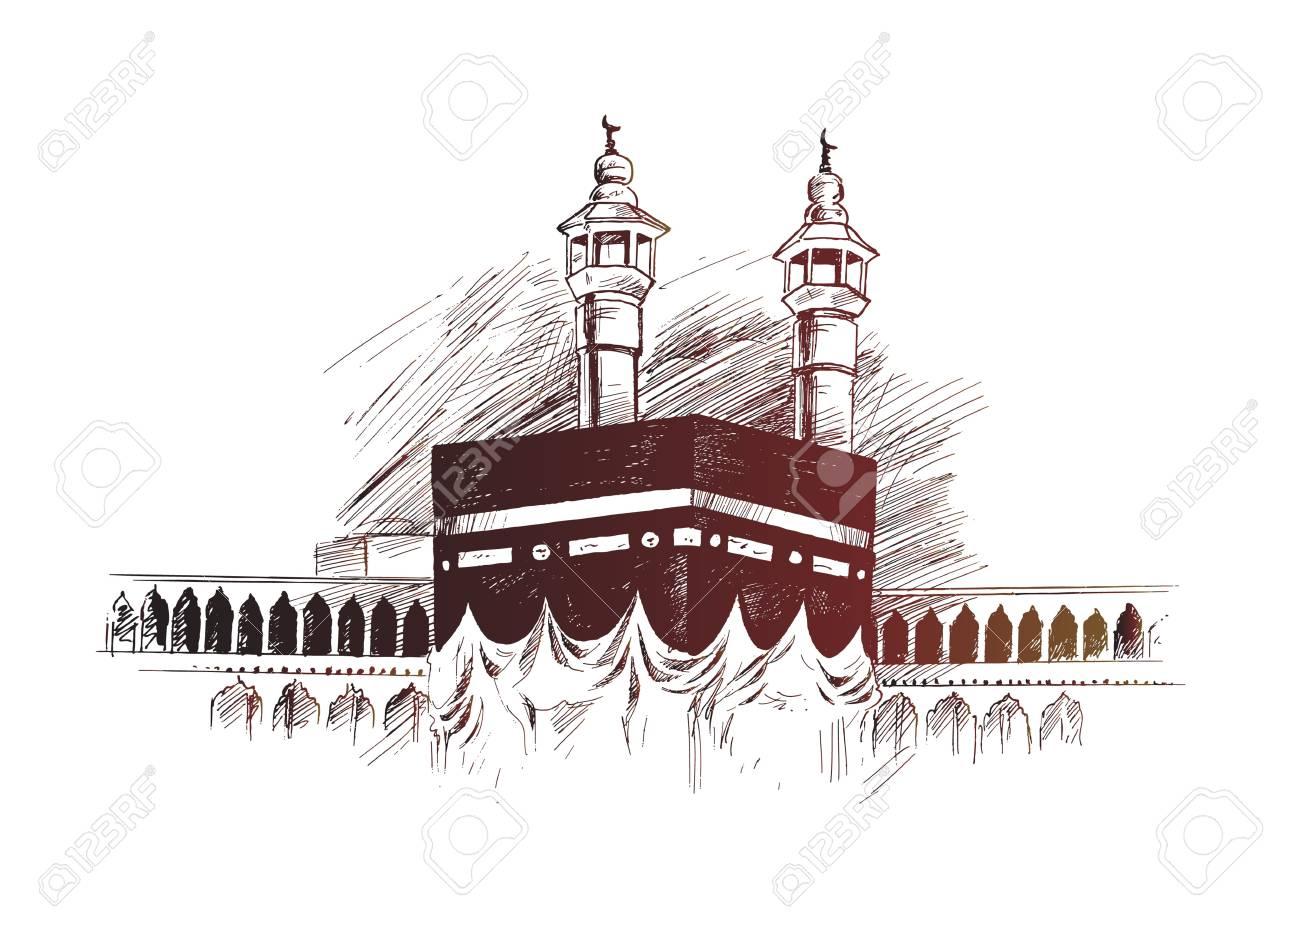 Holy Kaaba in Mecca Saudi Arabia, Hand Drawn Sketch Vector illustration. - 100478054